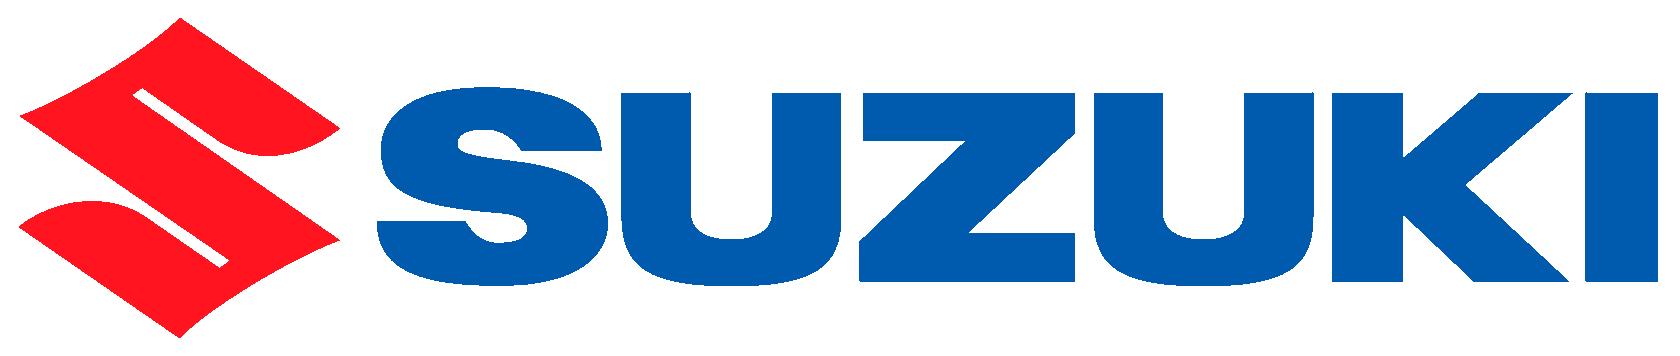 Suzuki Техник-Центр Харьков.